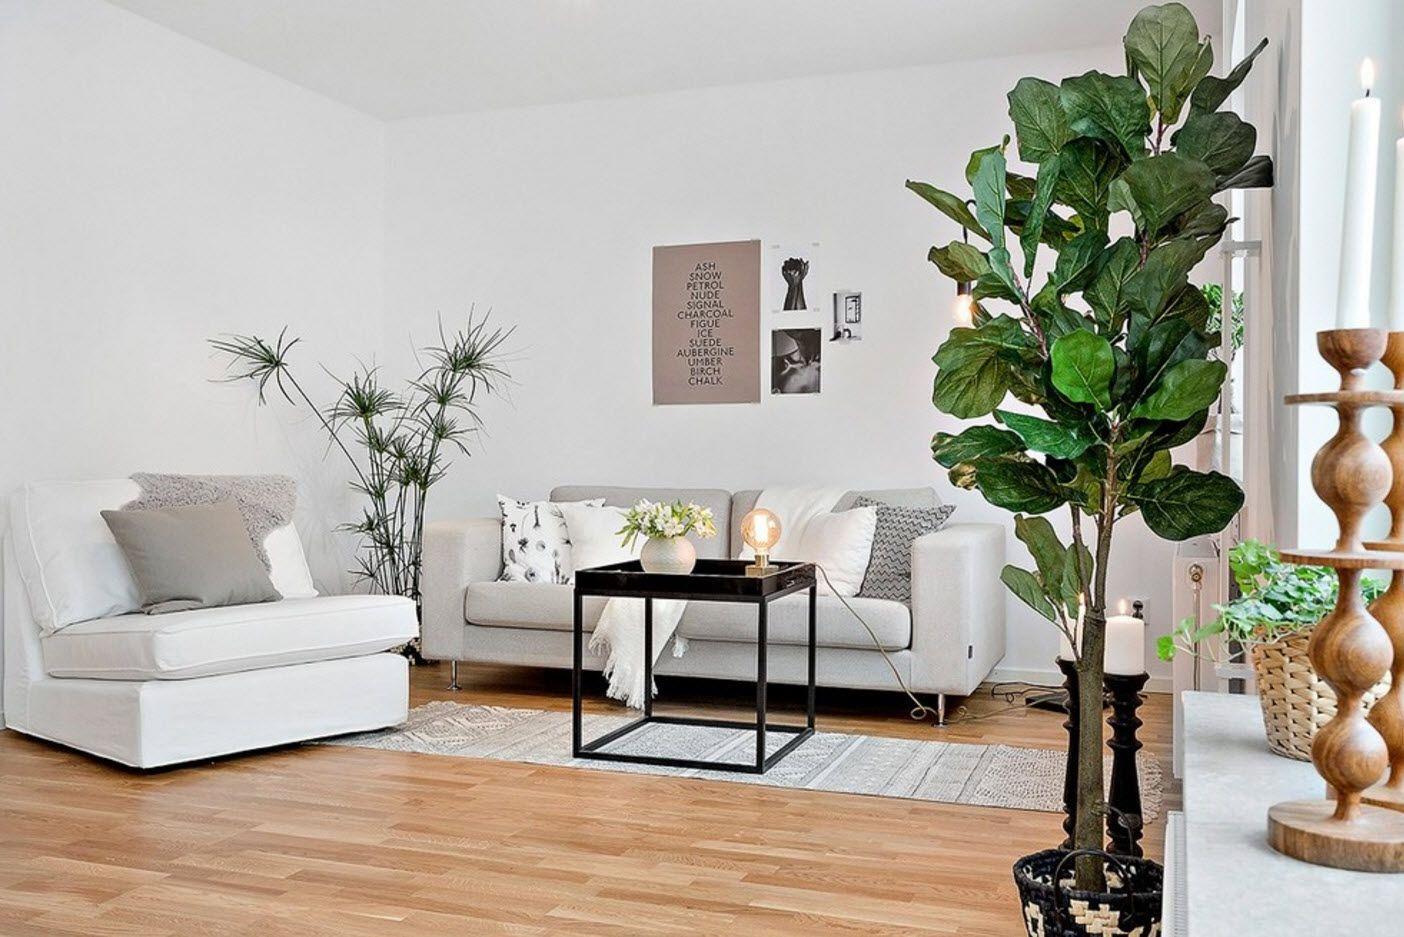 Greenery in the modern Scandinavian style room in gray